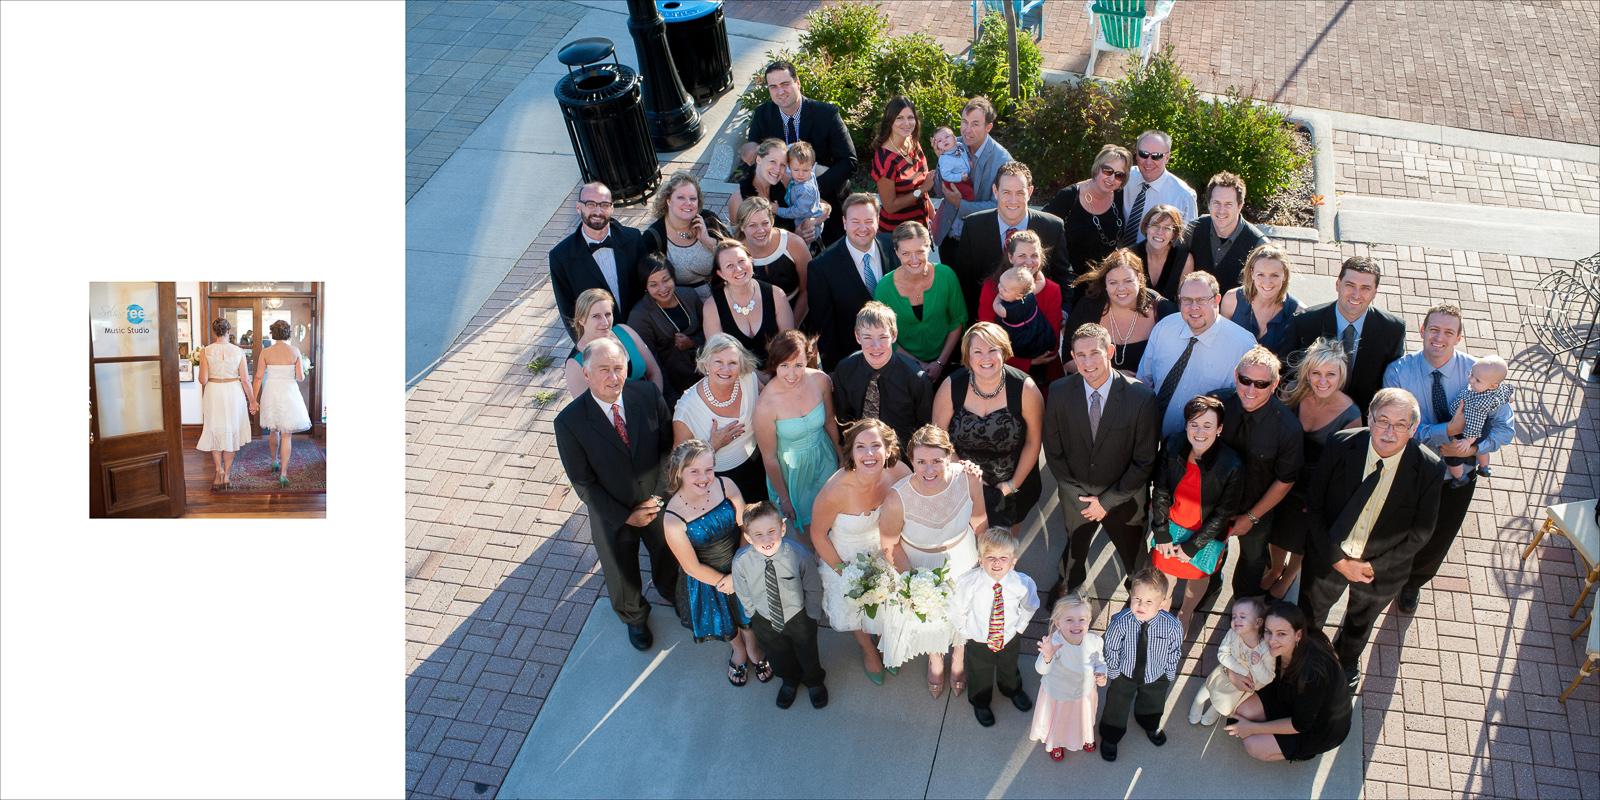 collingwood-wedding-photo-album-016.jpg